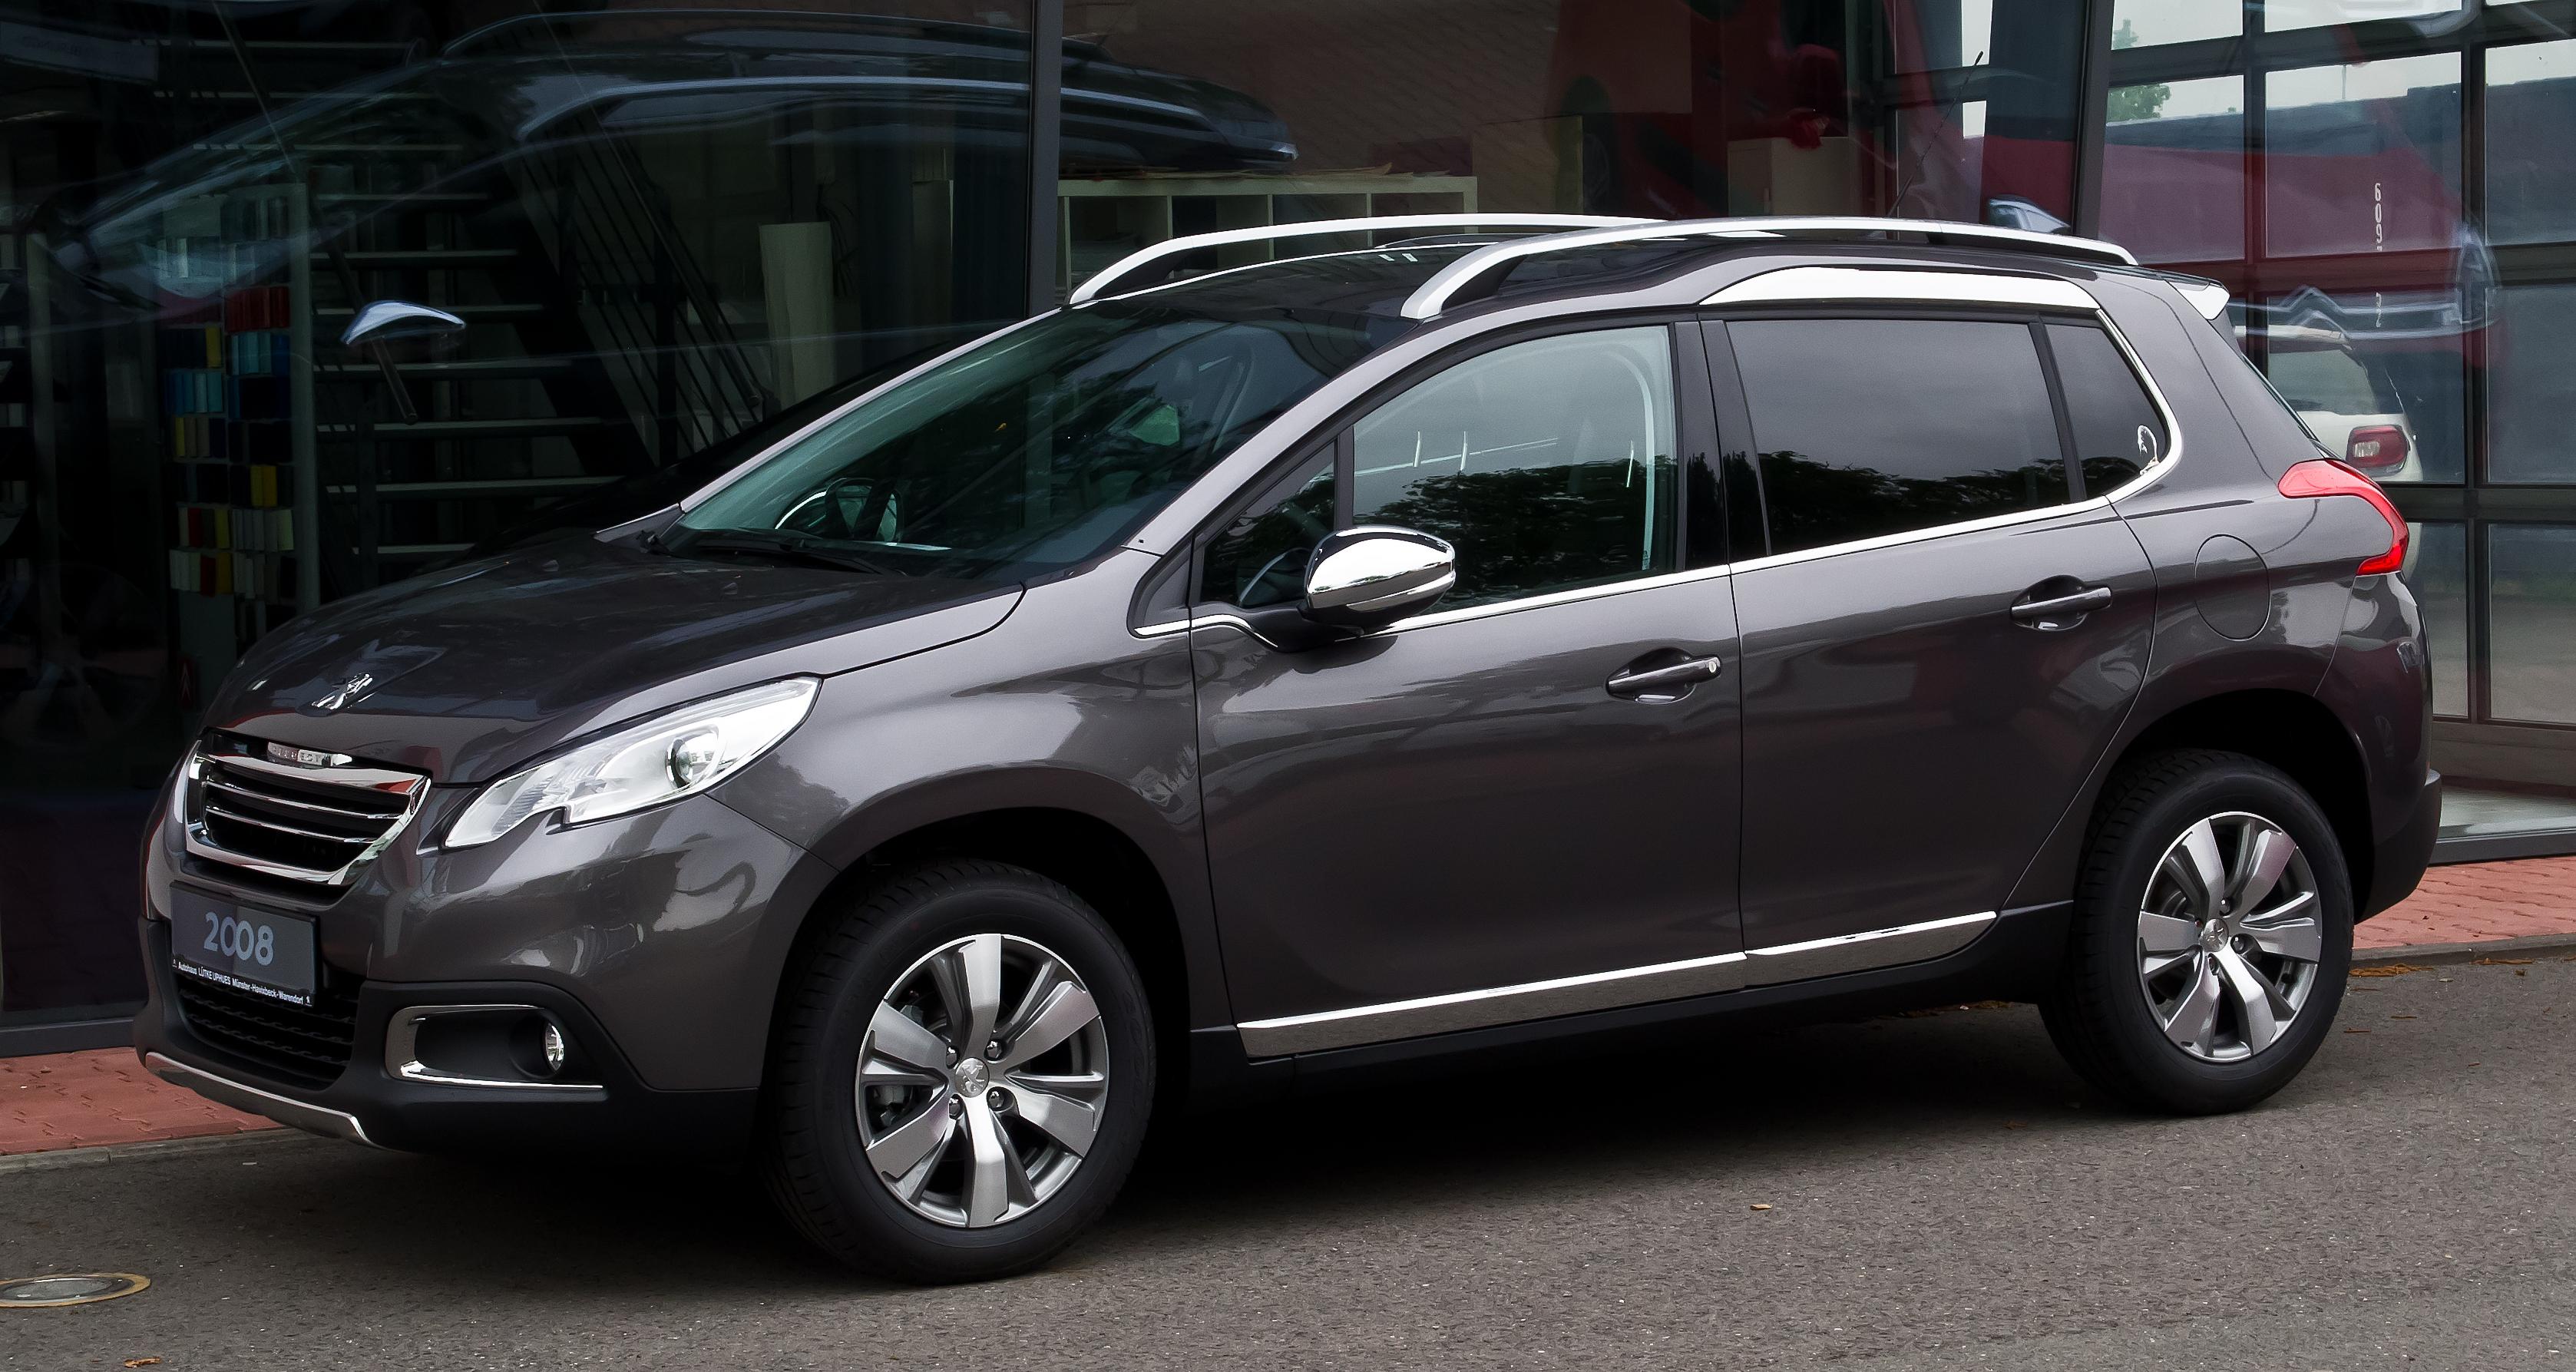 Photo of Peugeot 2008 106431 Image size 3355 x 1787 Upload date